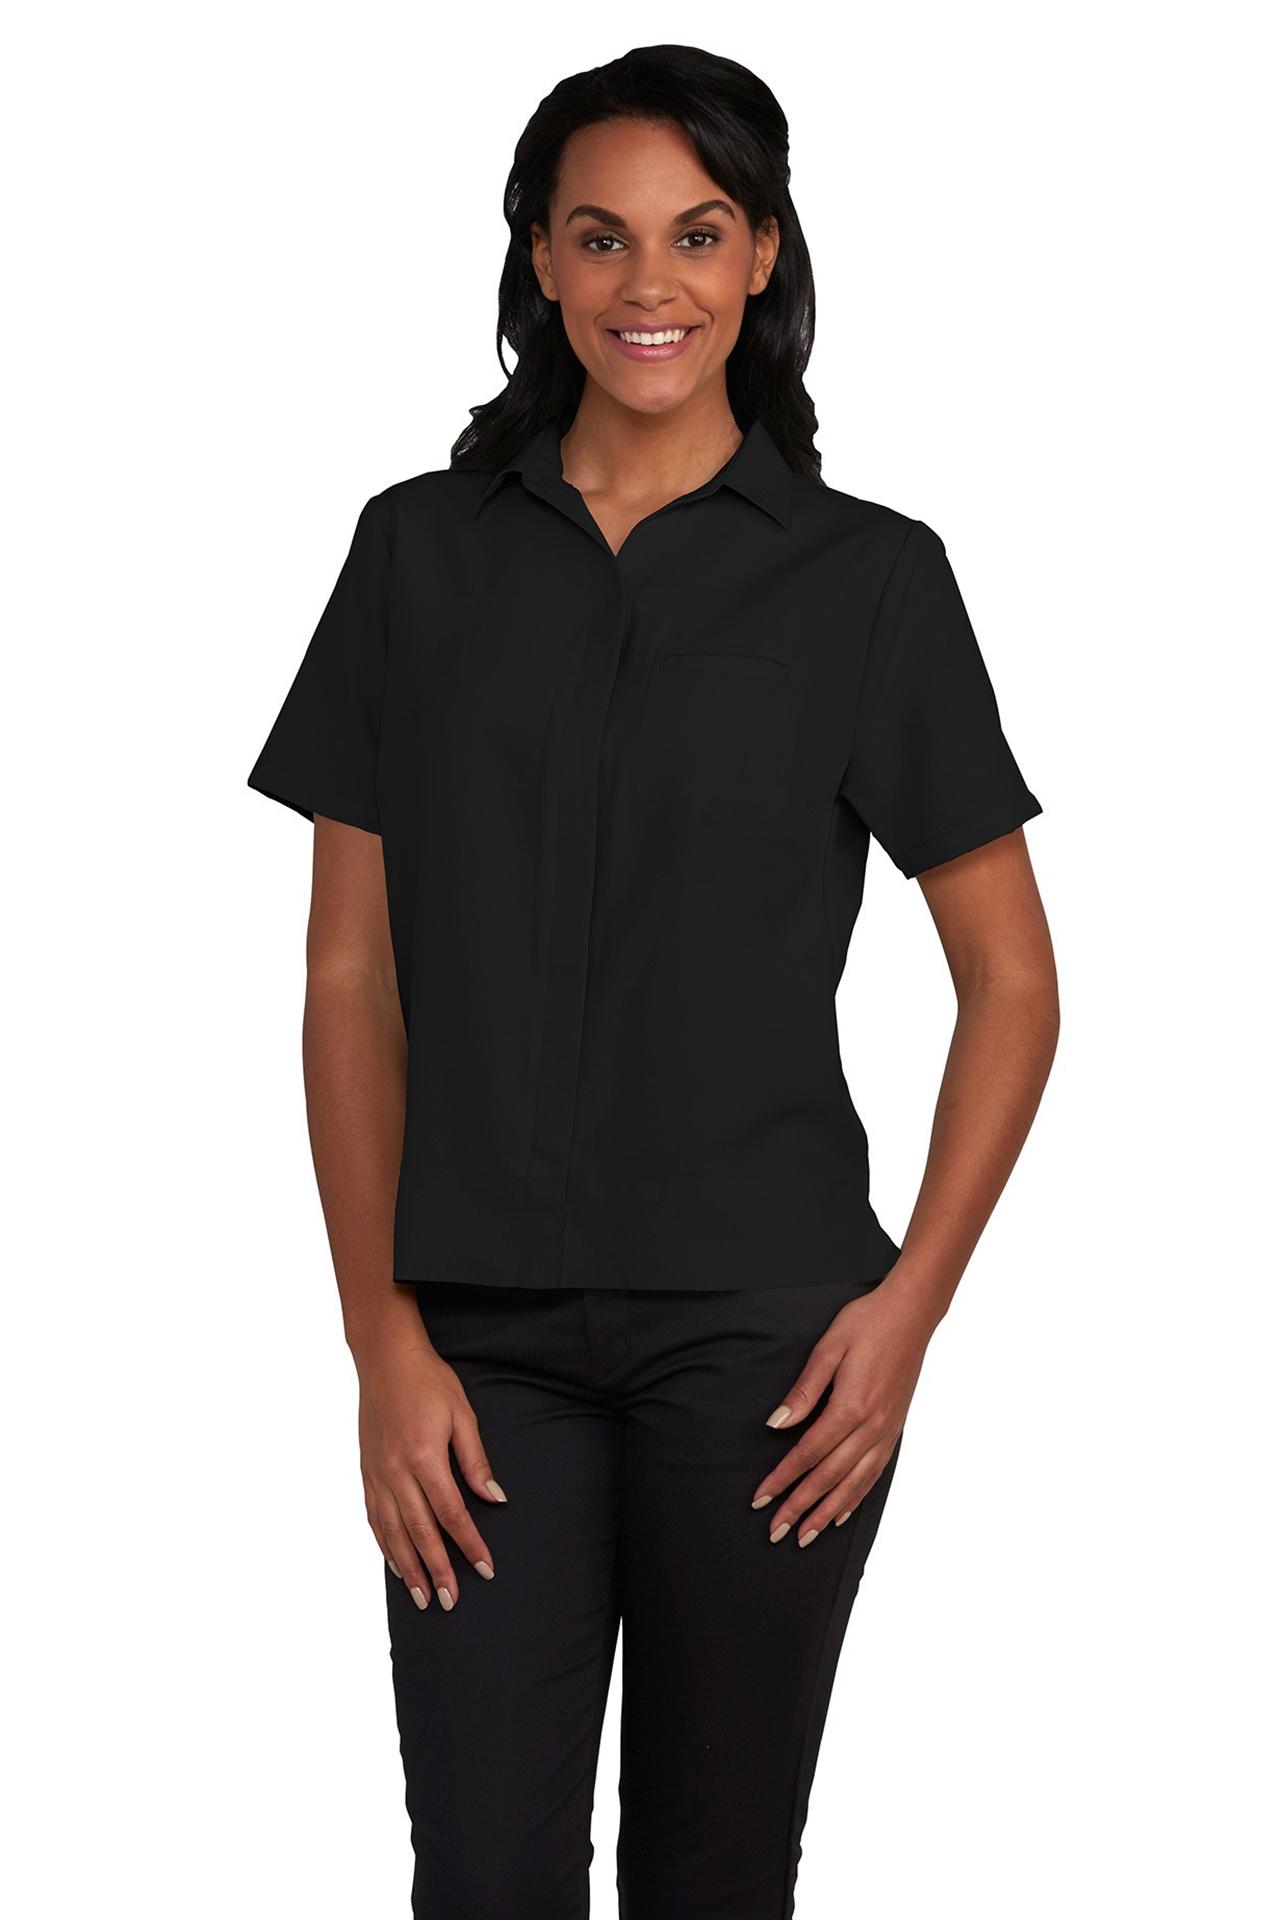 Womens Hospitality Camp Shirt, Spread Collar-A Plus